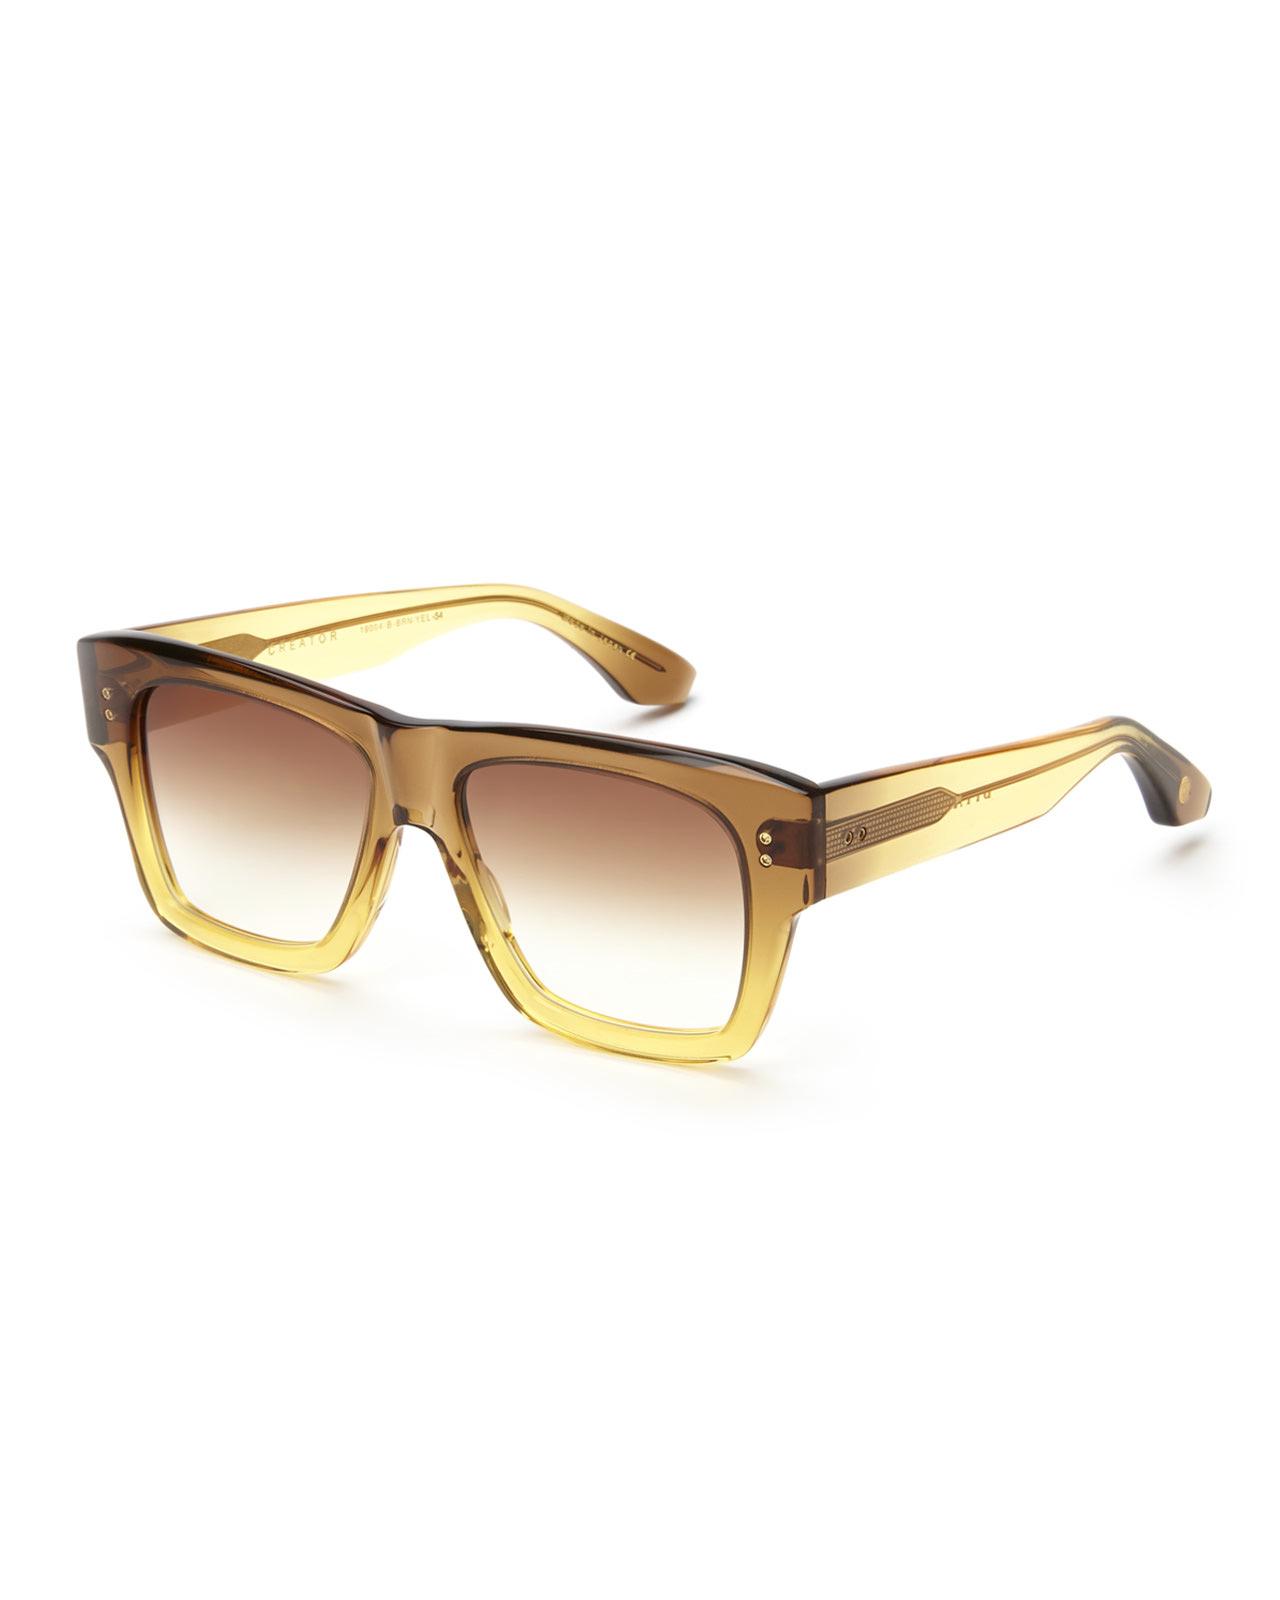 89d588e9b07 Lyst - DITA 19004 Creator Square Wayfarer Sunglasses in Yellow